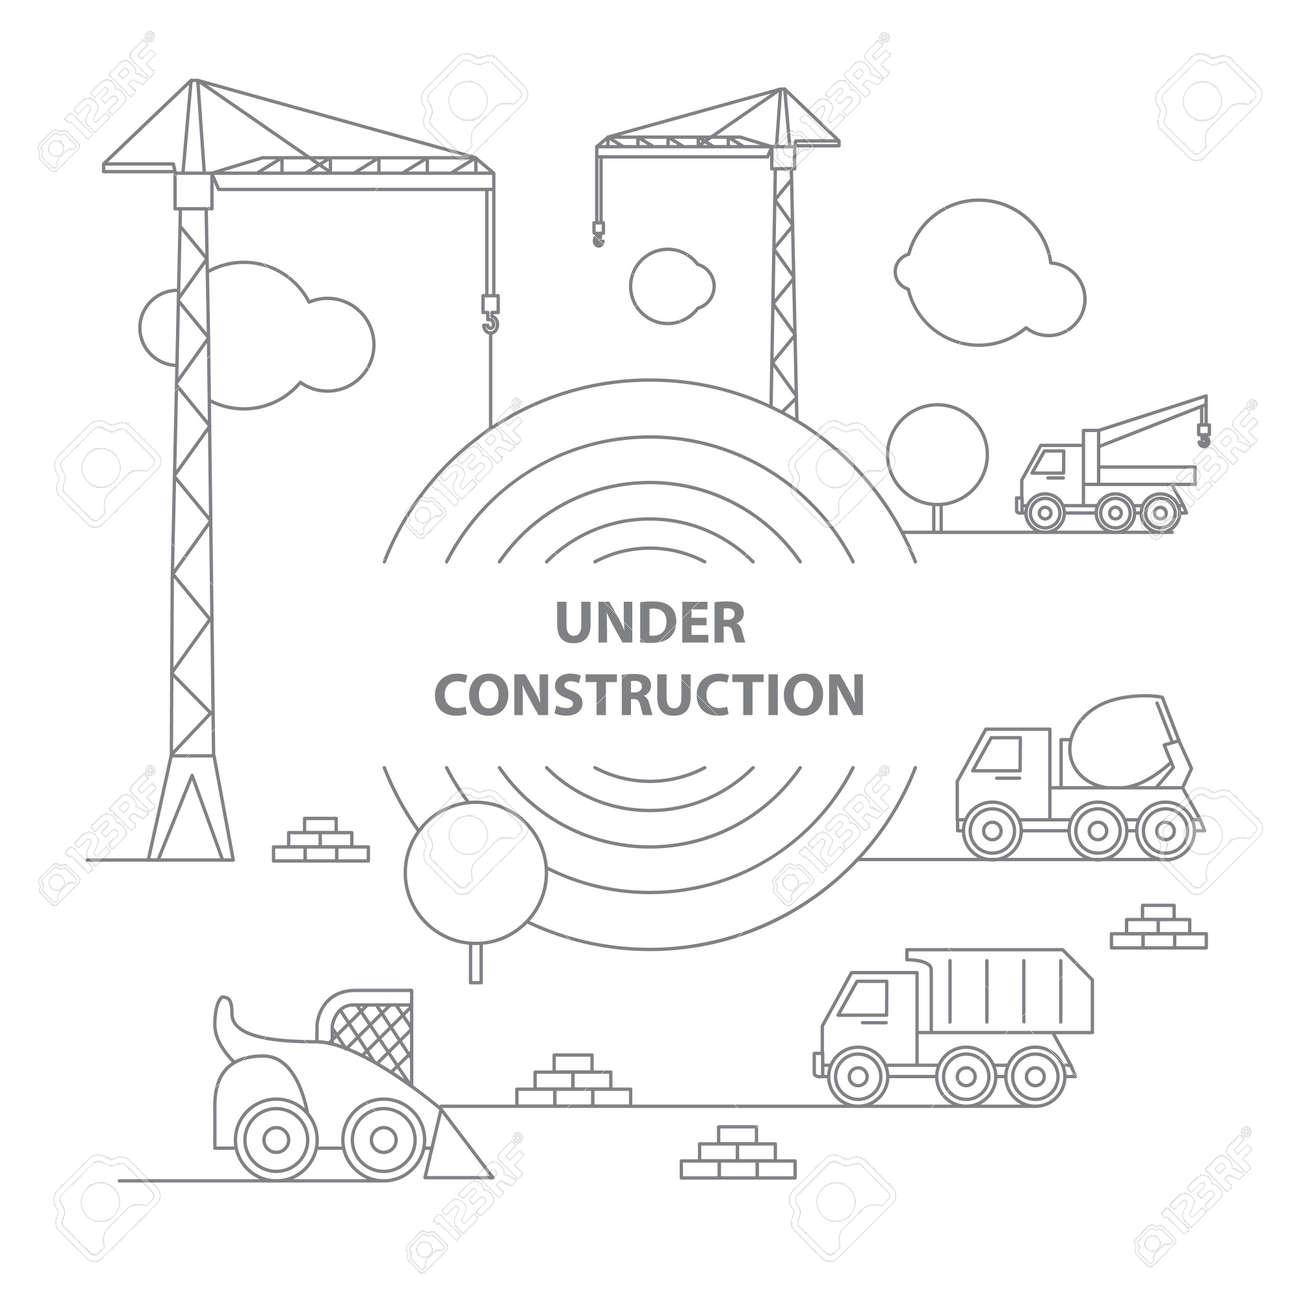 Gebäude Unter Baustelle, Bau Infografiken, Vektor Illustration ...